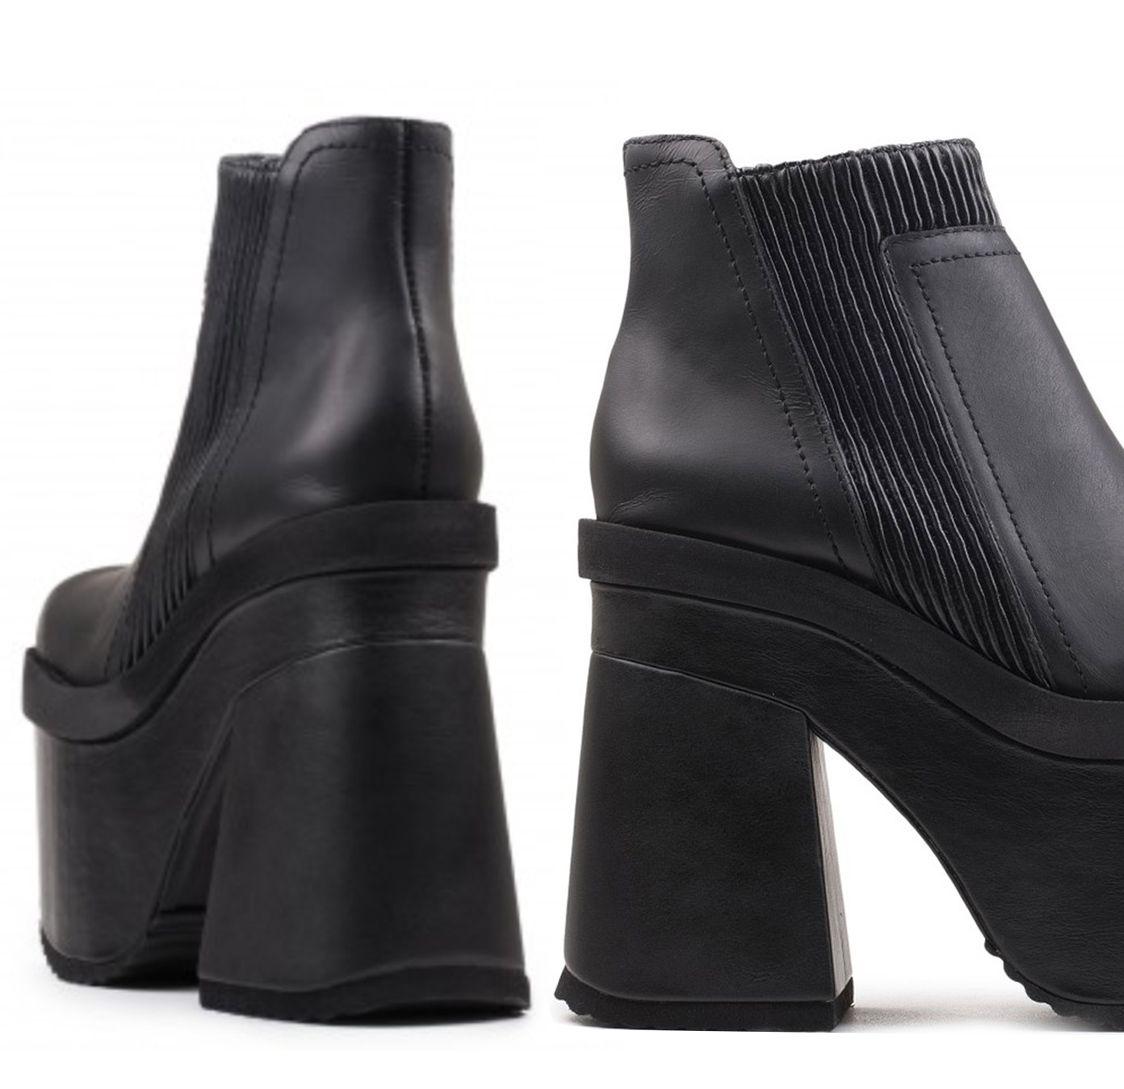 3c41945bee10  Glencoe  by Jeffrey Campbell.  Platforms  blackboots for women.